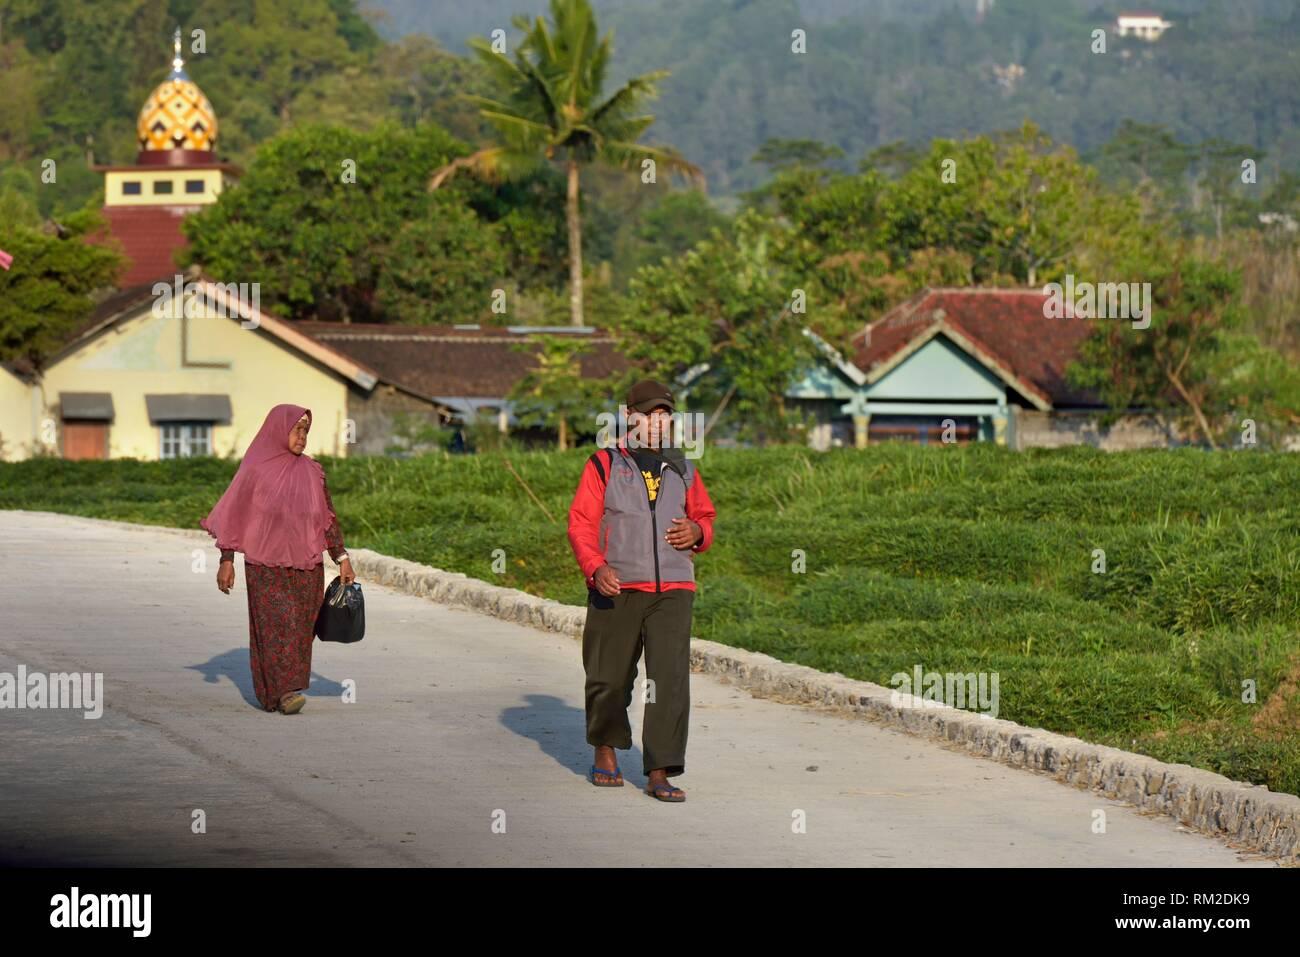 Dorf in Tawangmangu, Karanganyar Bezirk, in der Nähe von Surakarta (Solo), Insel Java, Indonesien, Südostasien. Stockbild